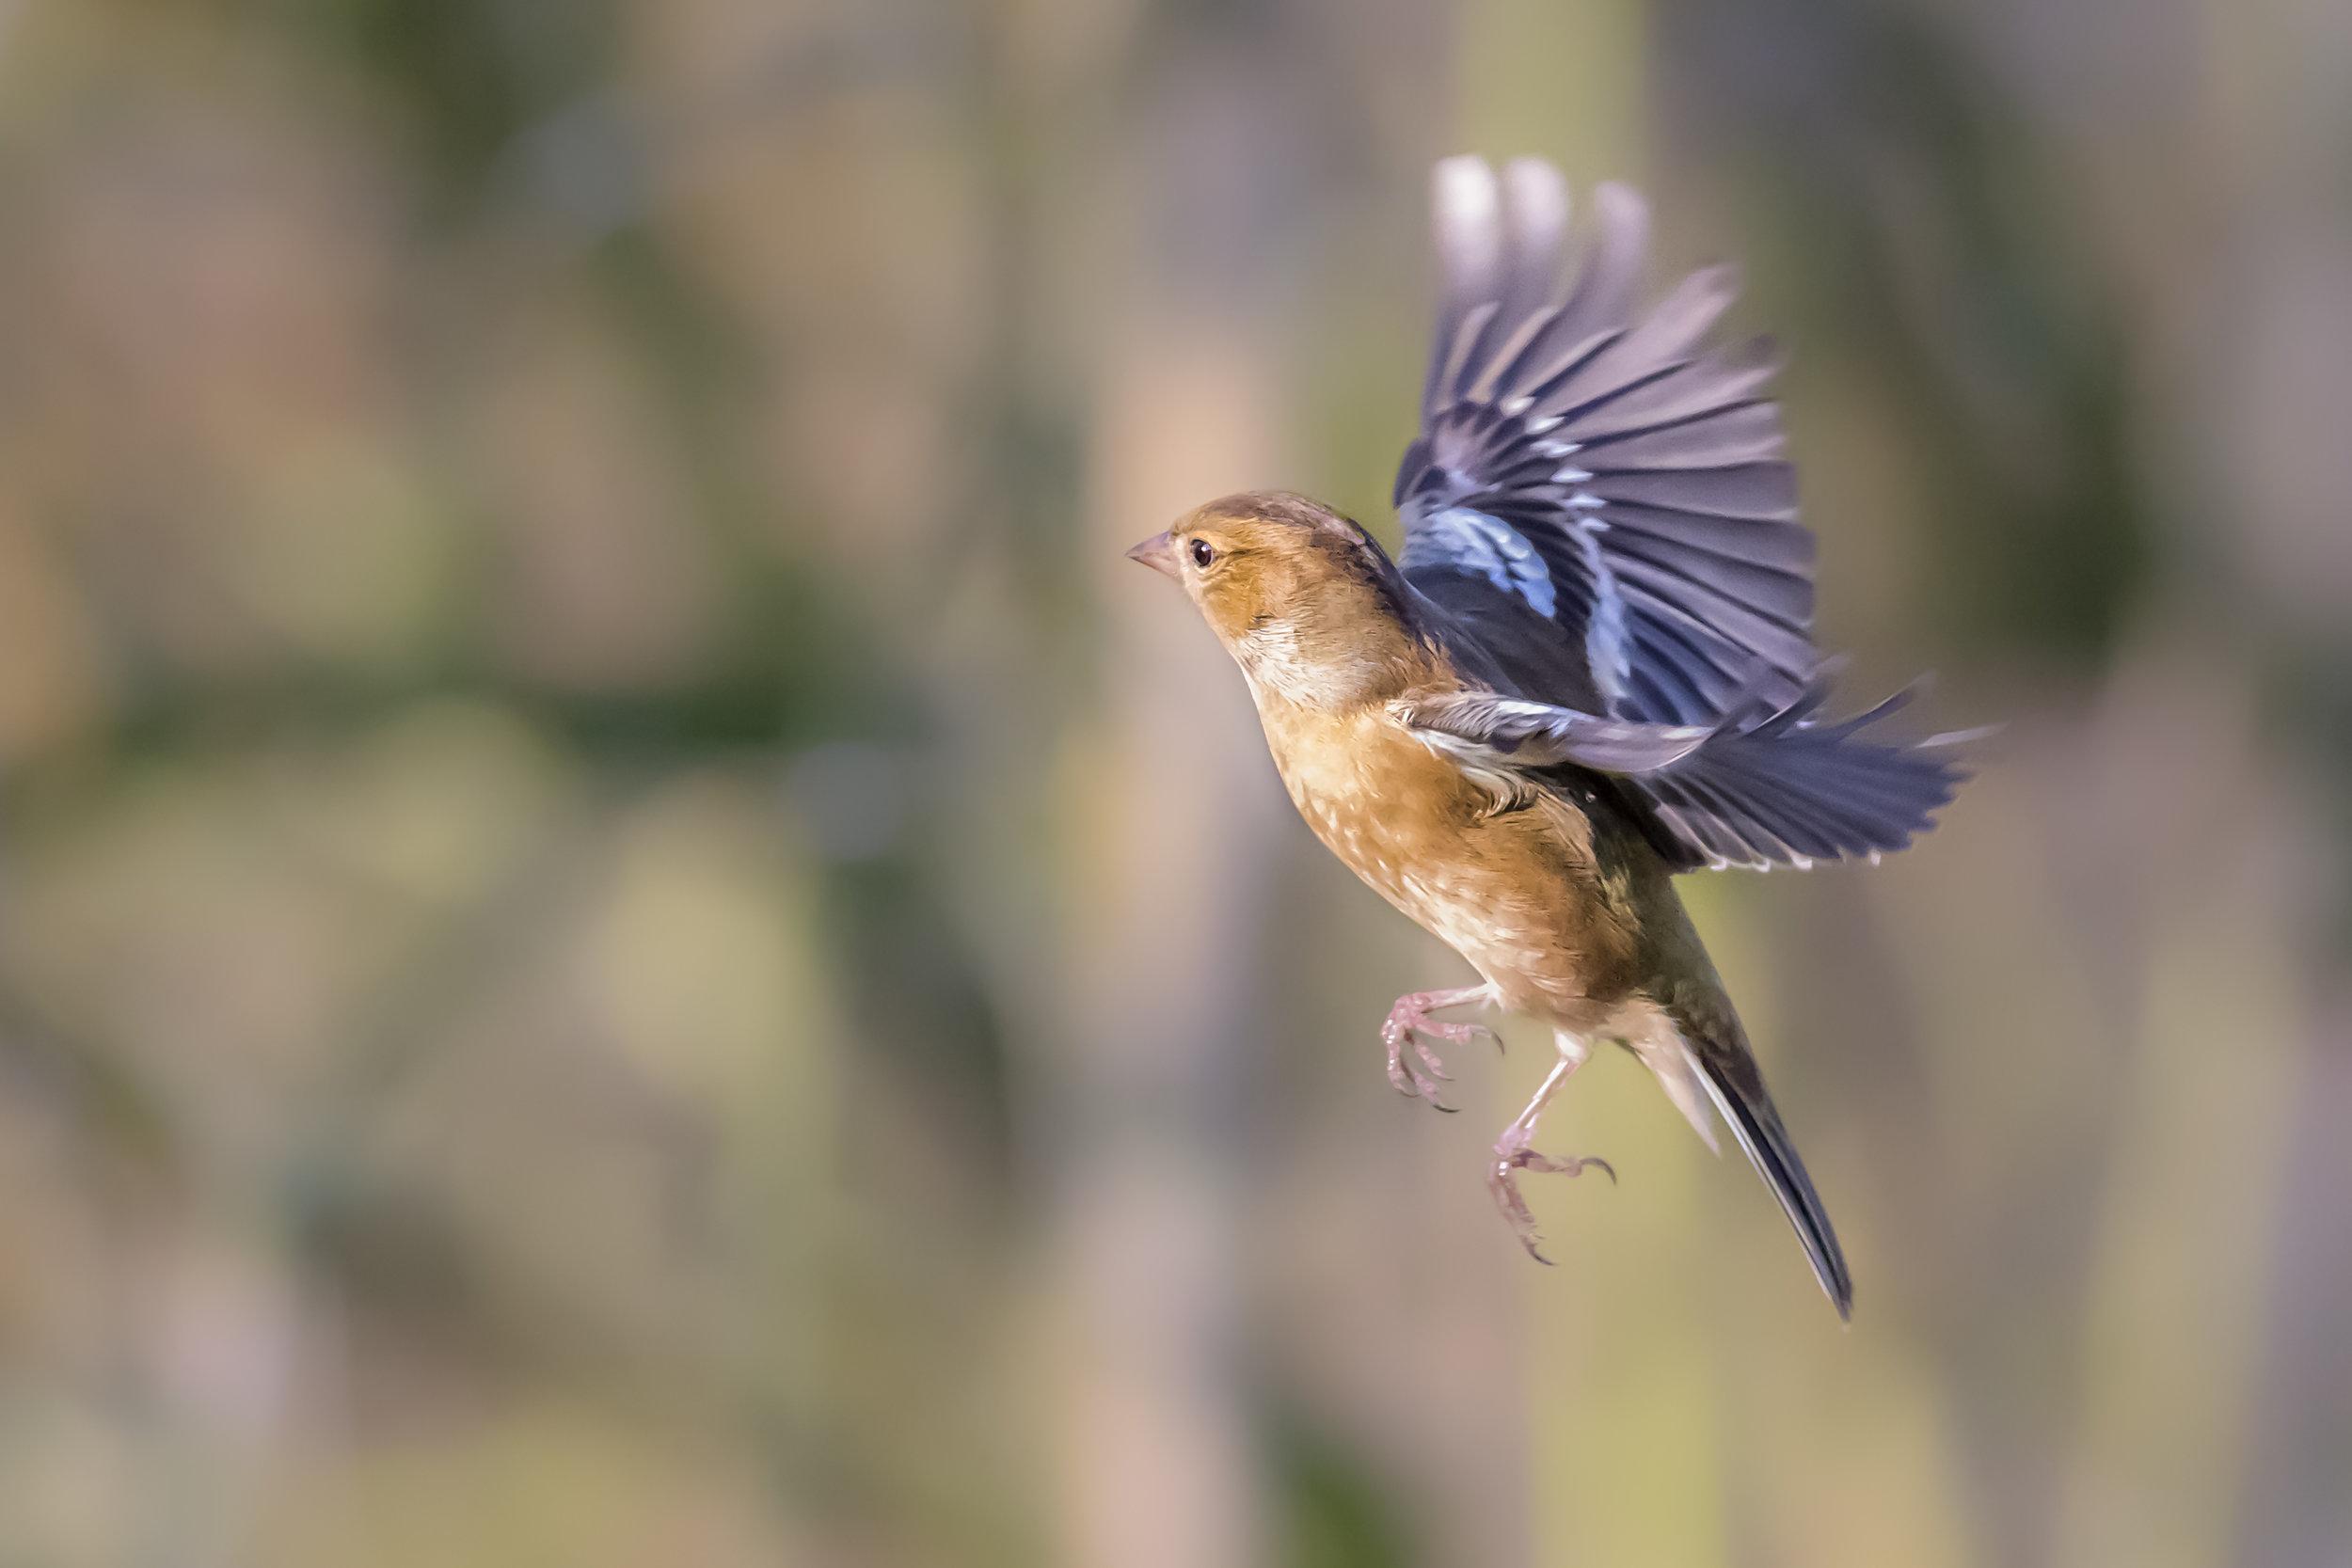 Chaffinch flight